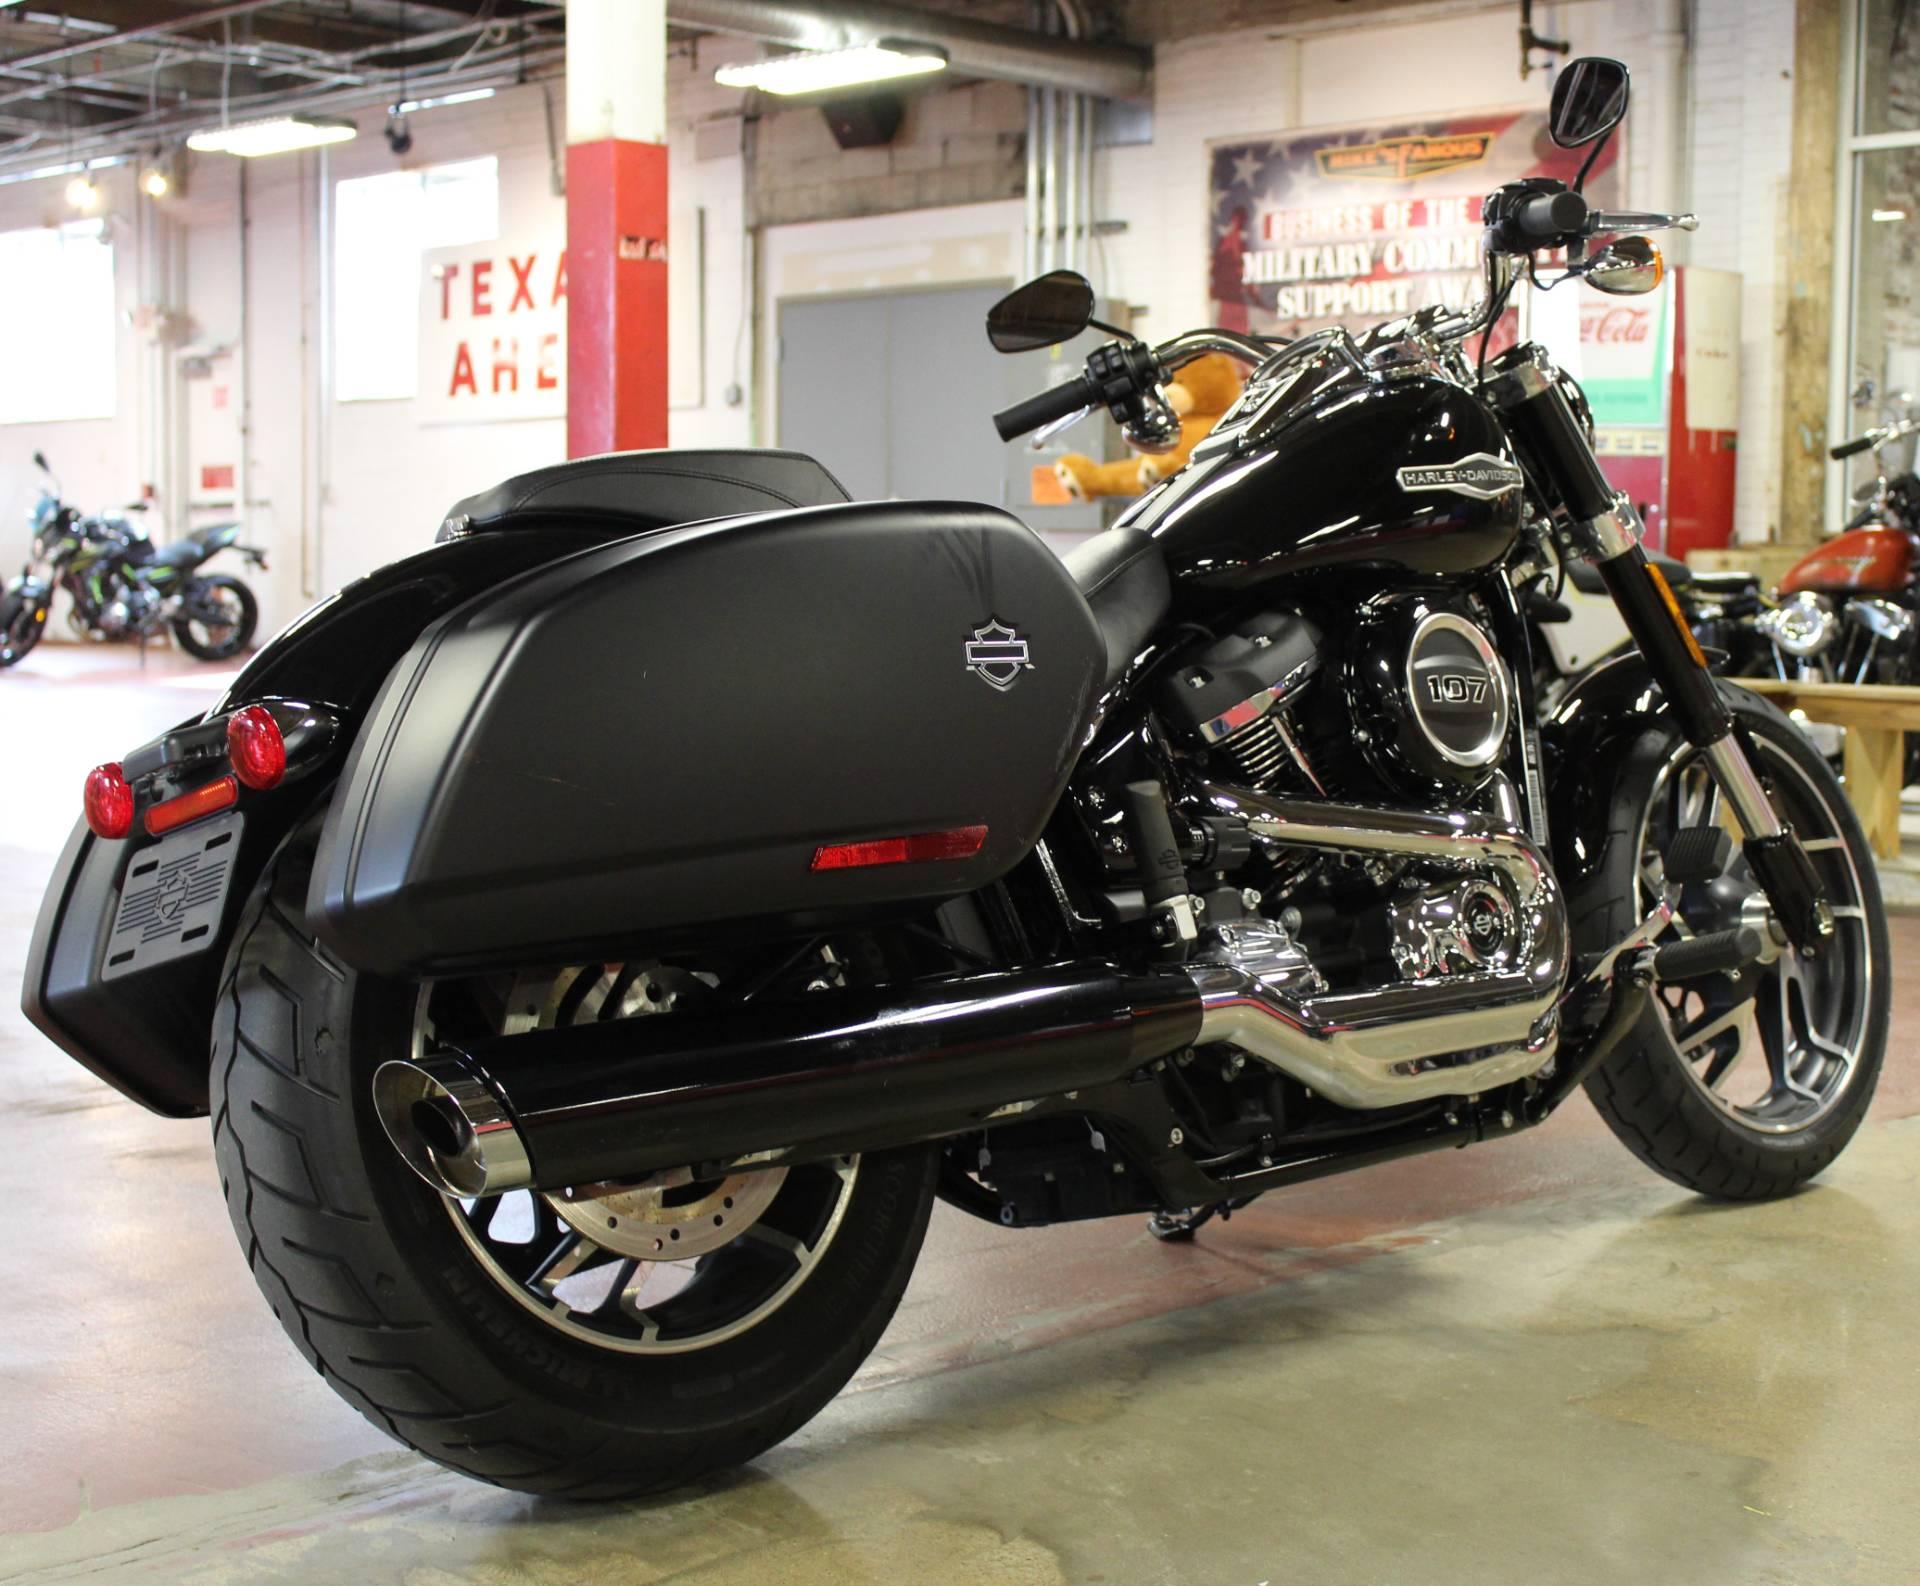 Harley-Davidson Unveils Barrage of New Bikes, Including